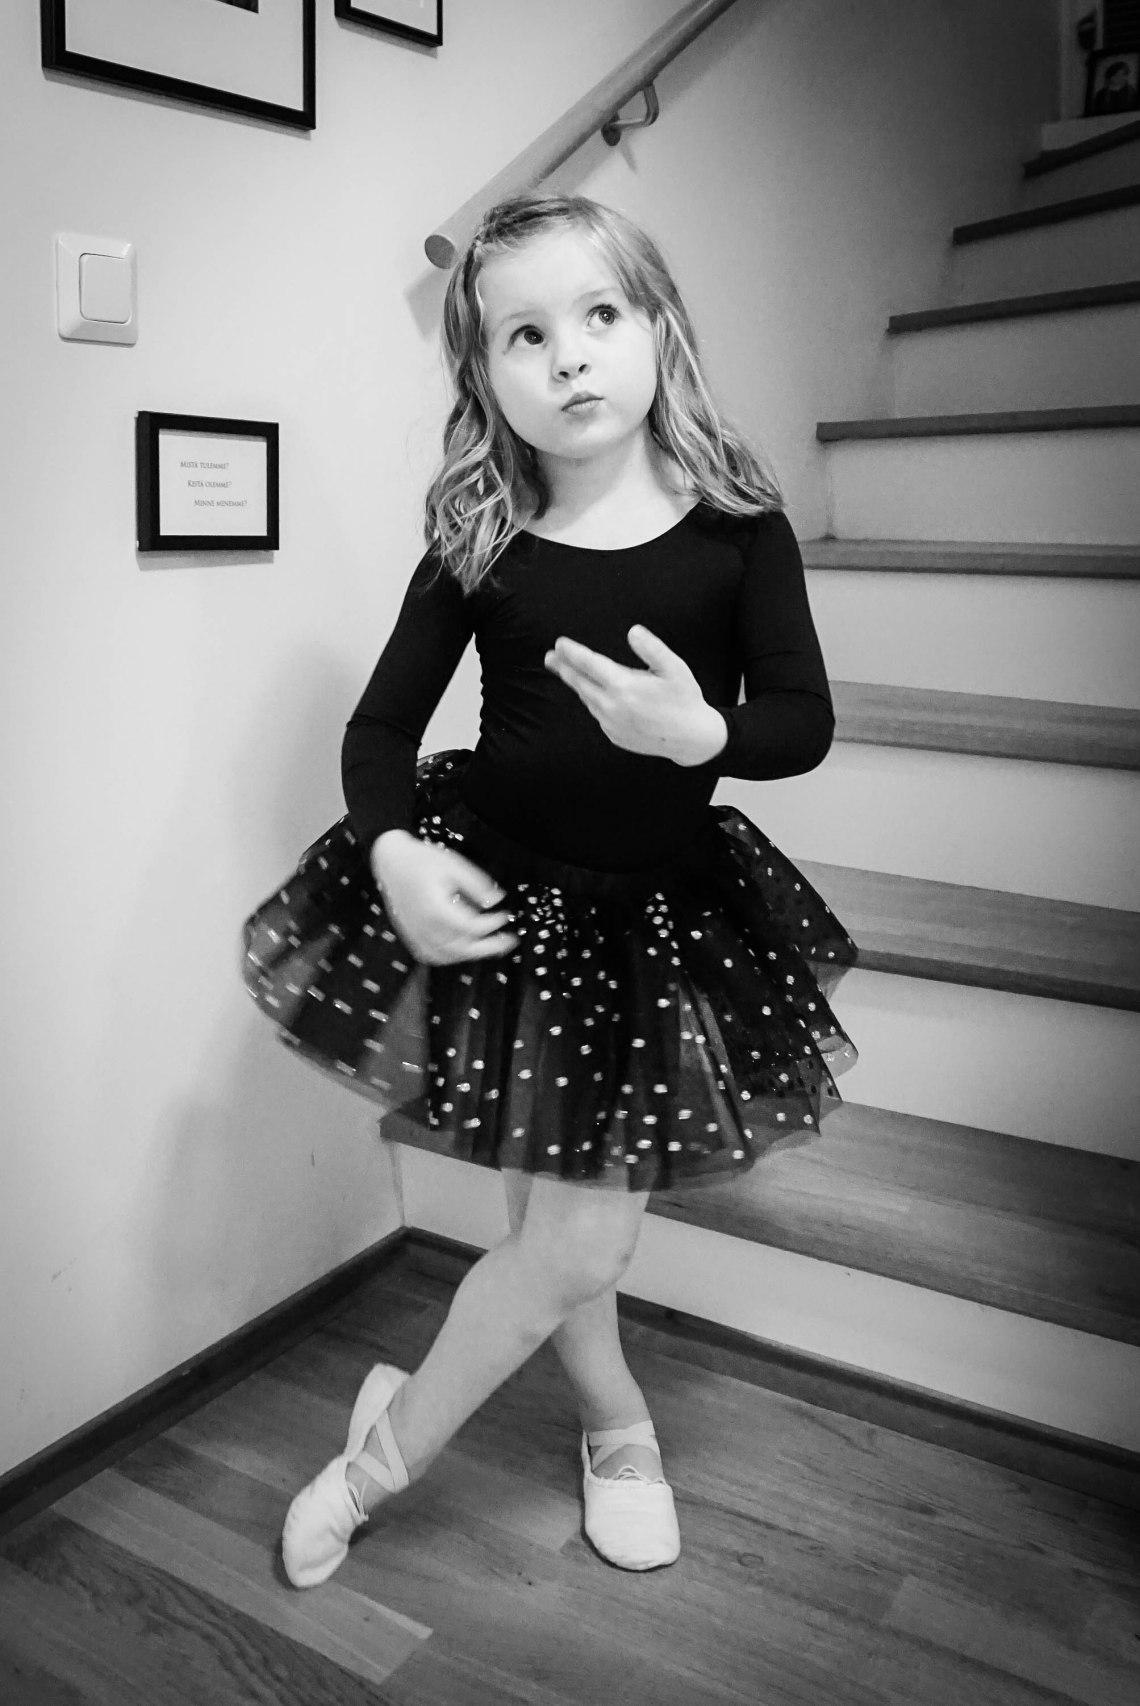 Black ballerina costume